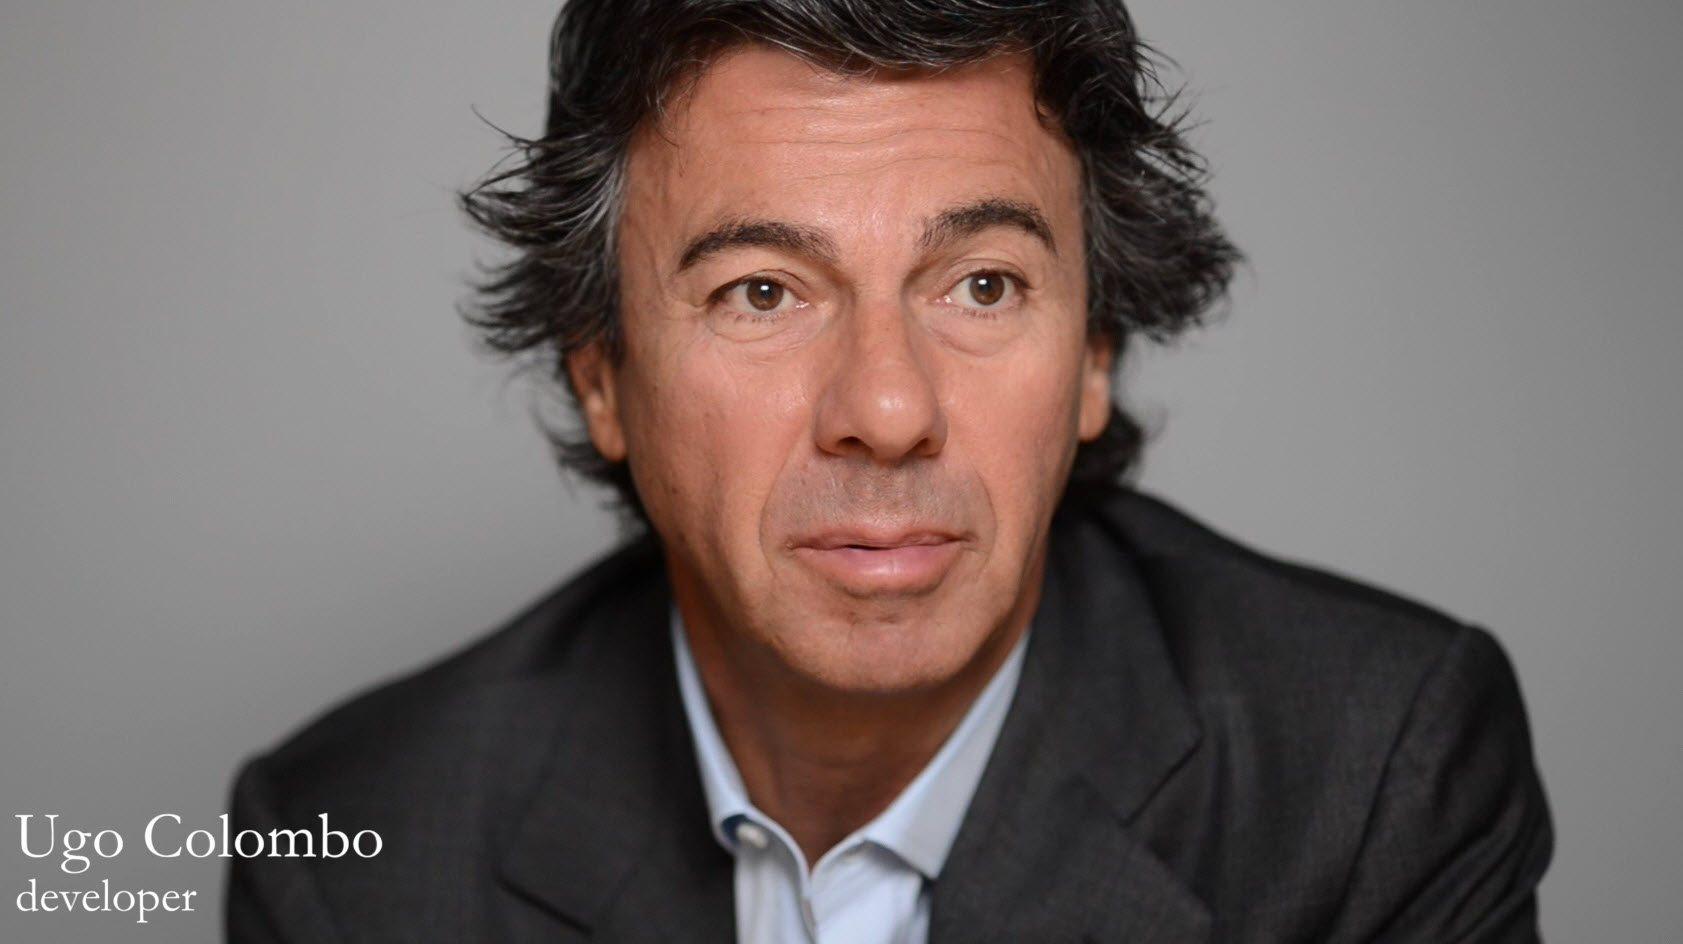 Ugo Colombo, developer of Brickell Flatiron